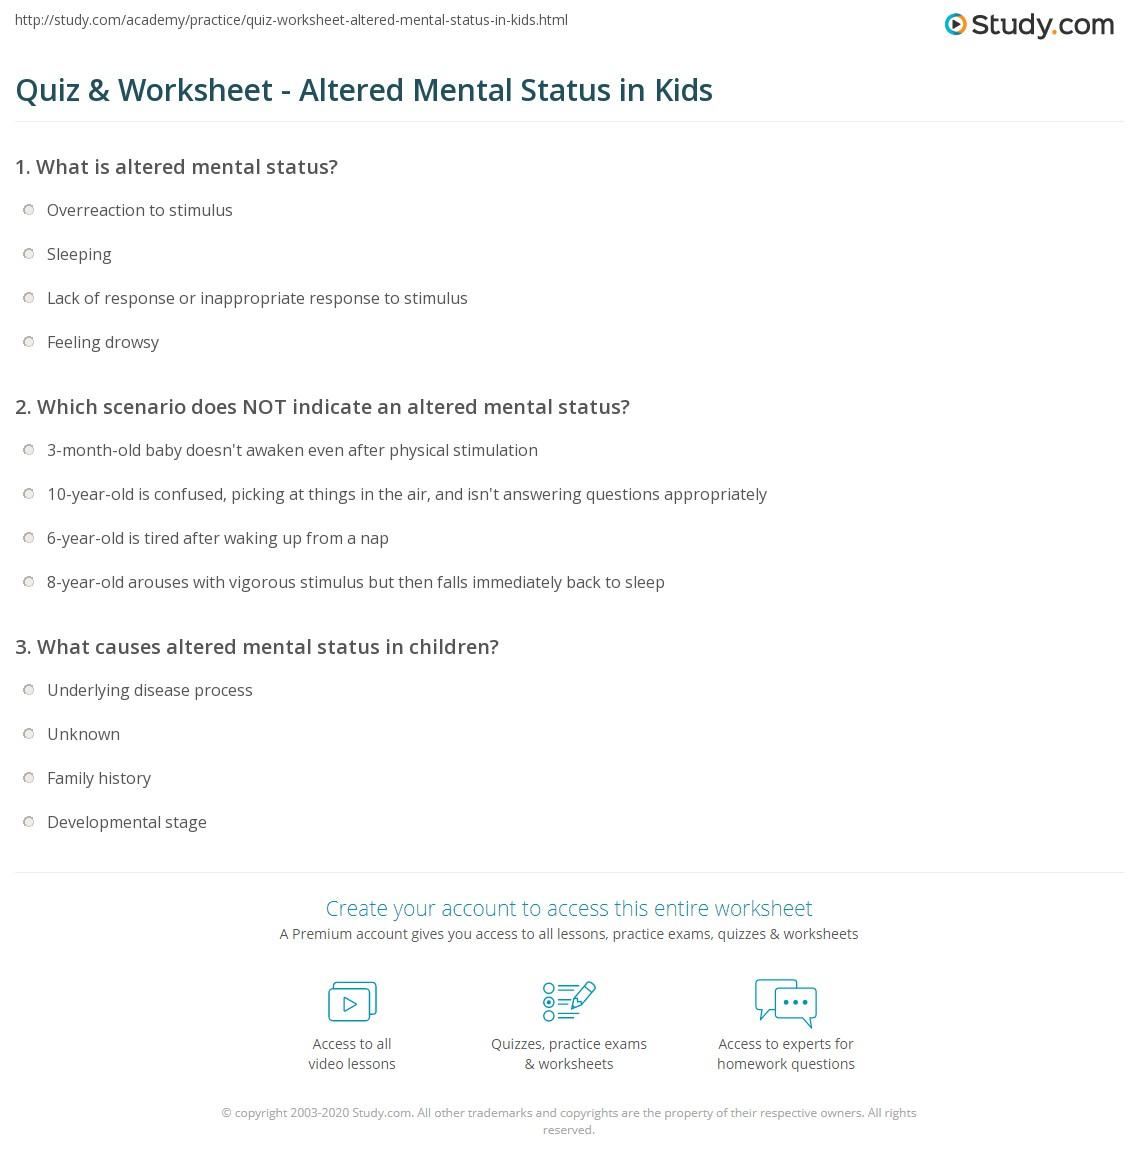 Quiz & Worksheet - Altered Mental Status in Kids   Study com